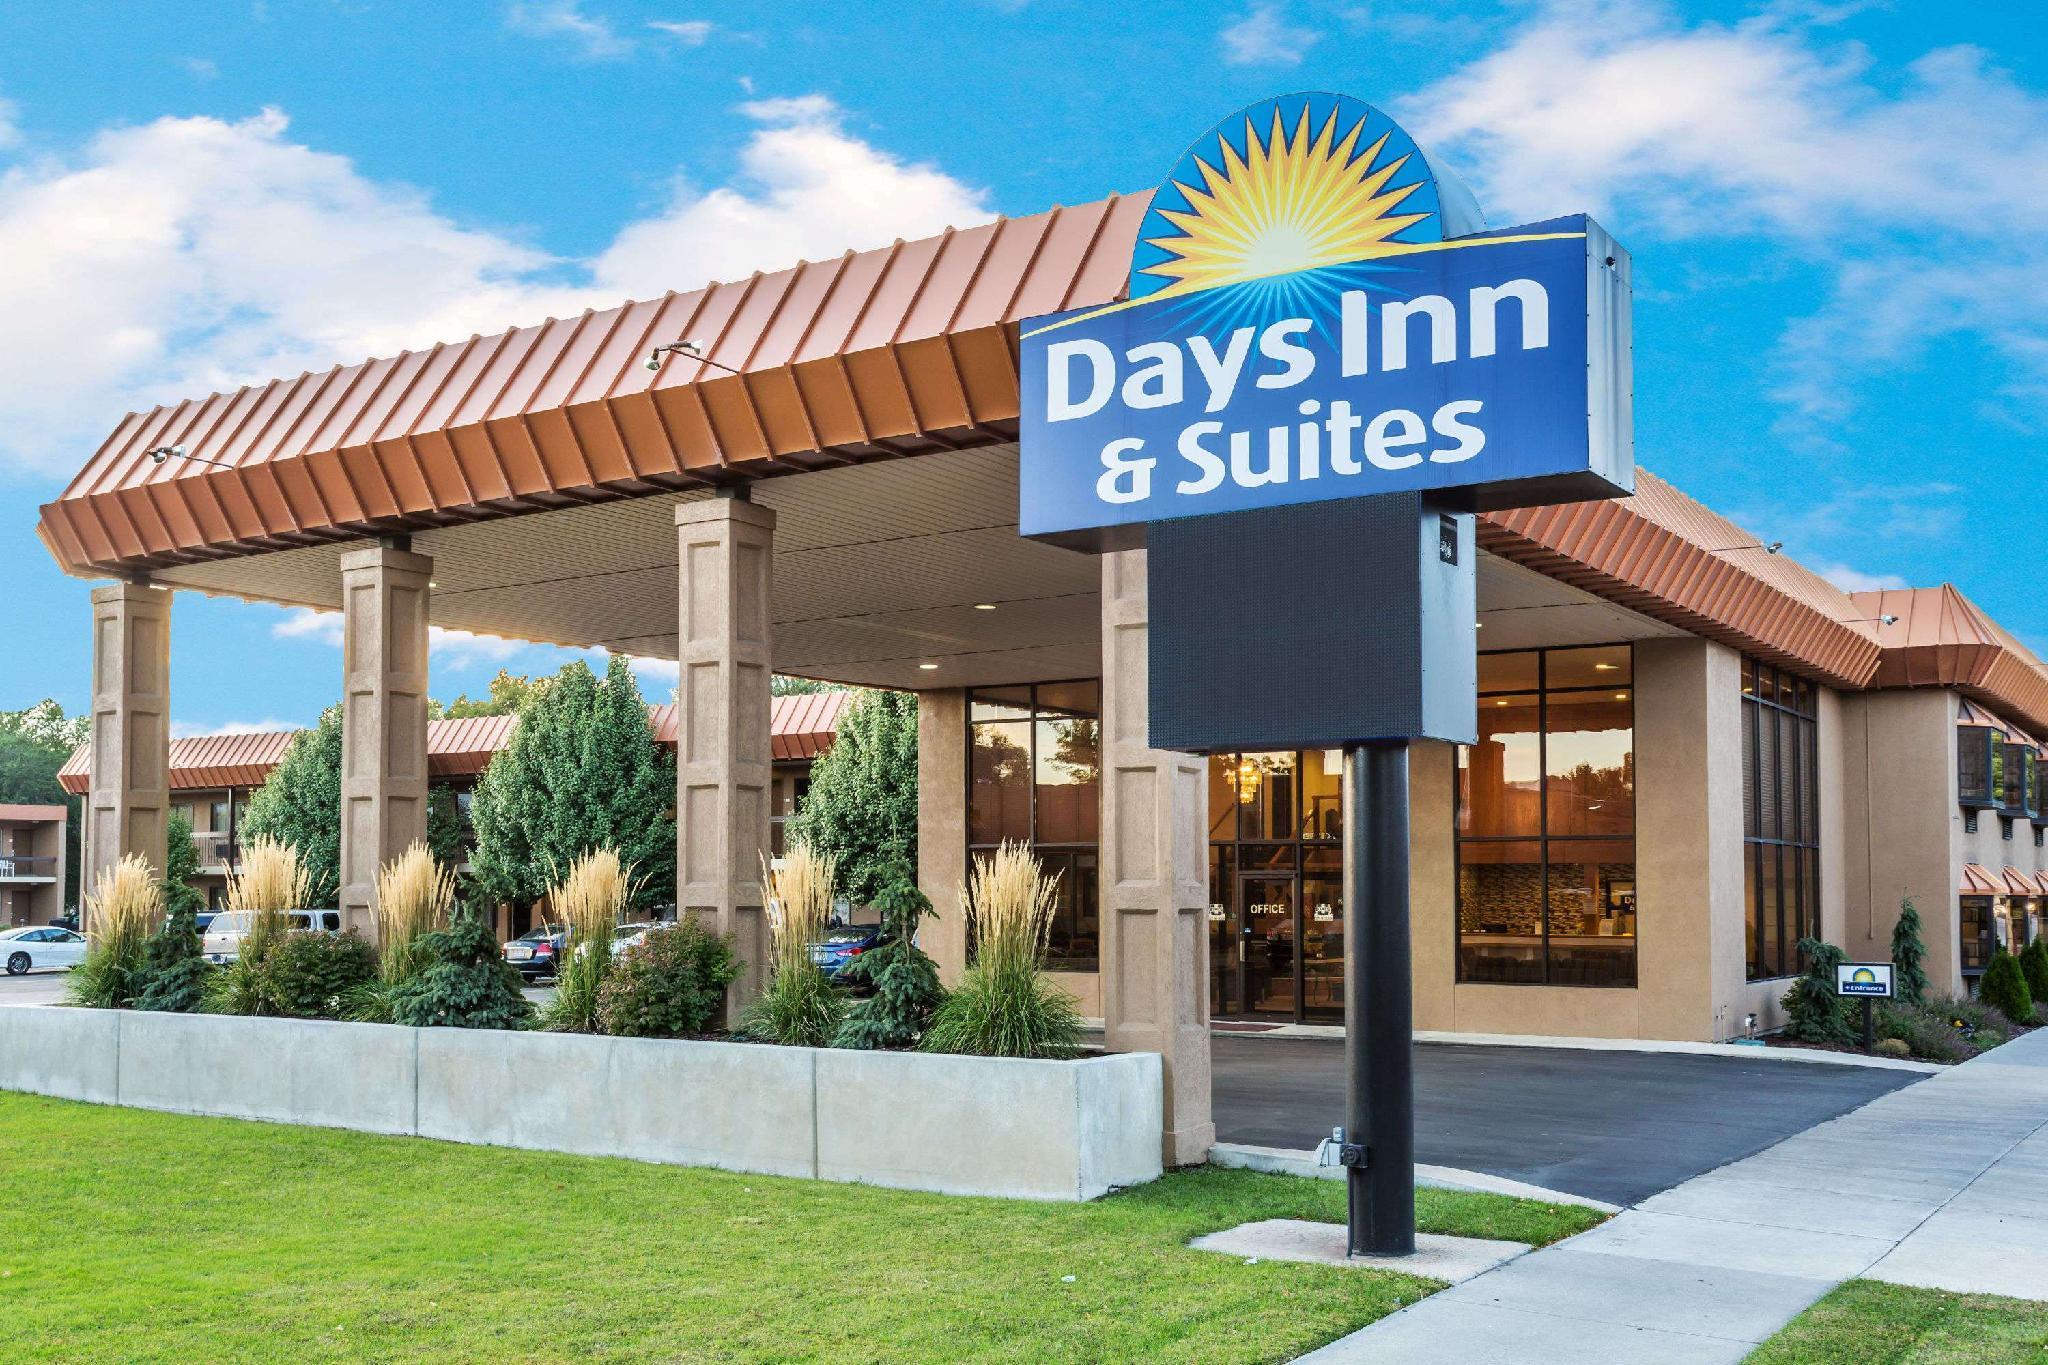 Days Inn And Suites By Wyndham Logan